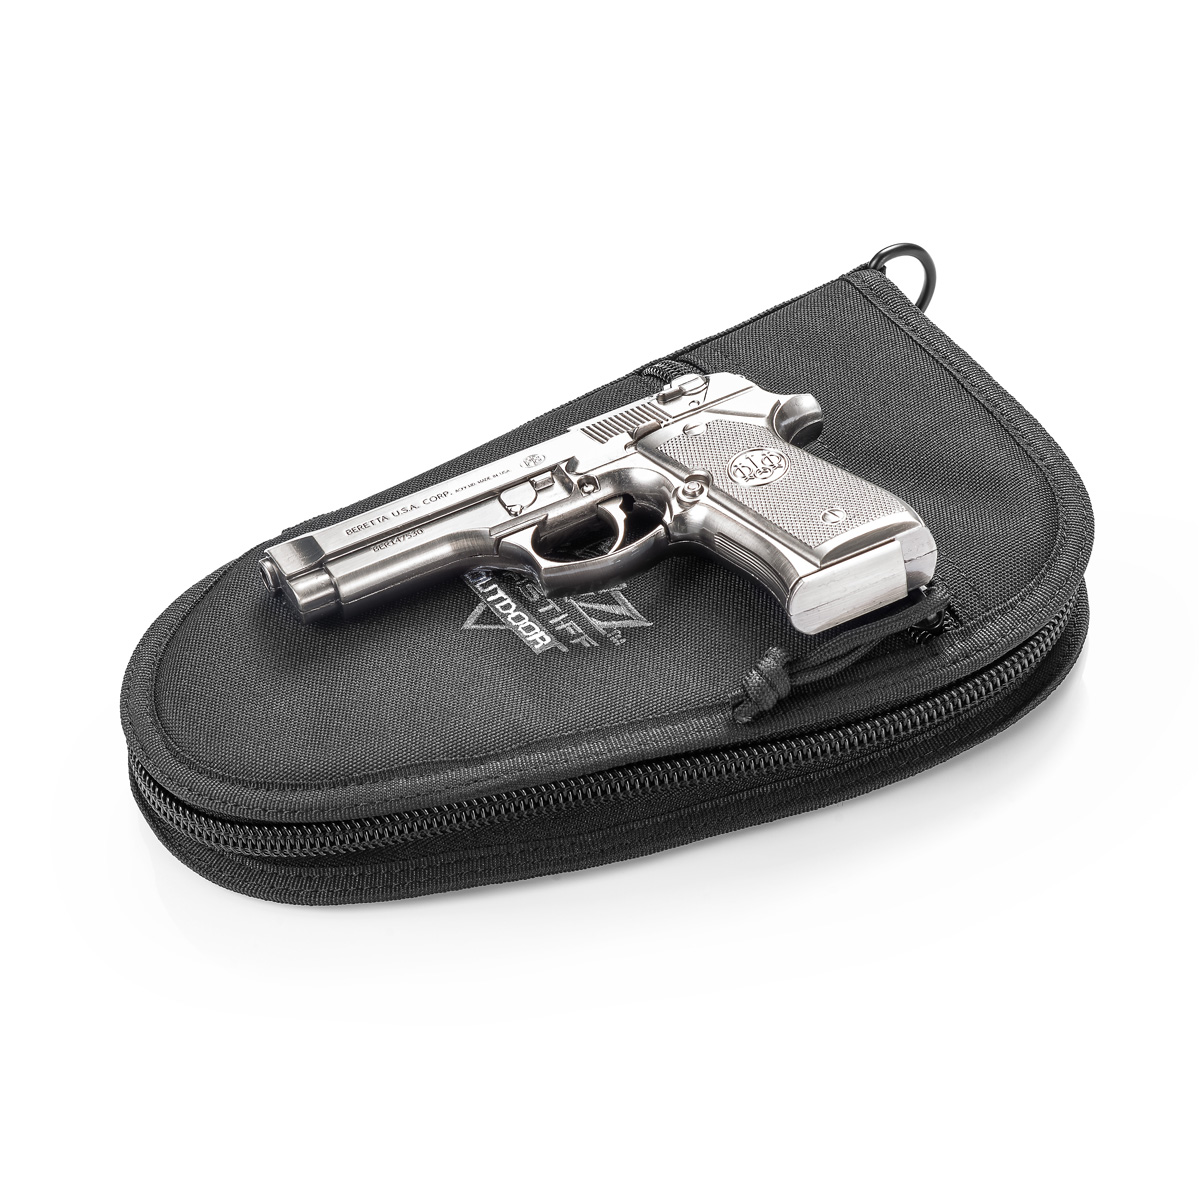 Outdoor tactical convenient pistol holster